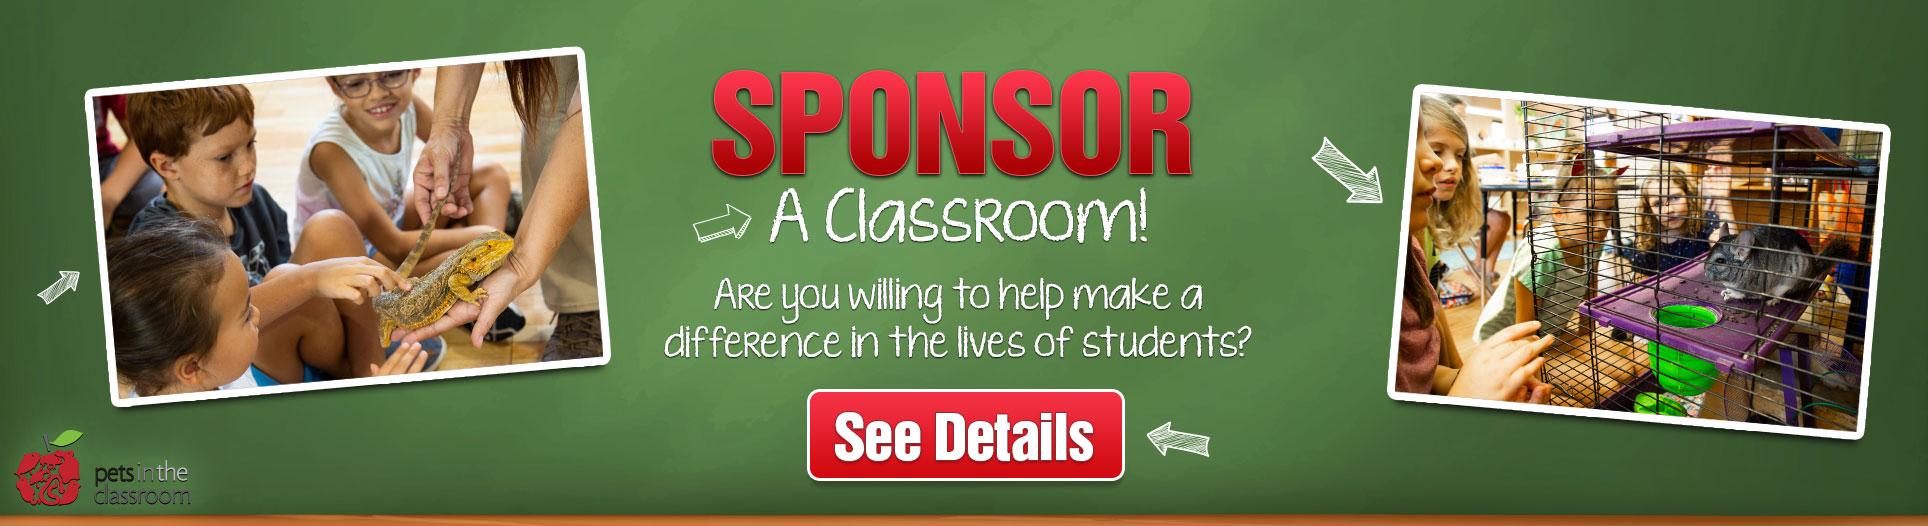 Sponsor a Classroom